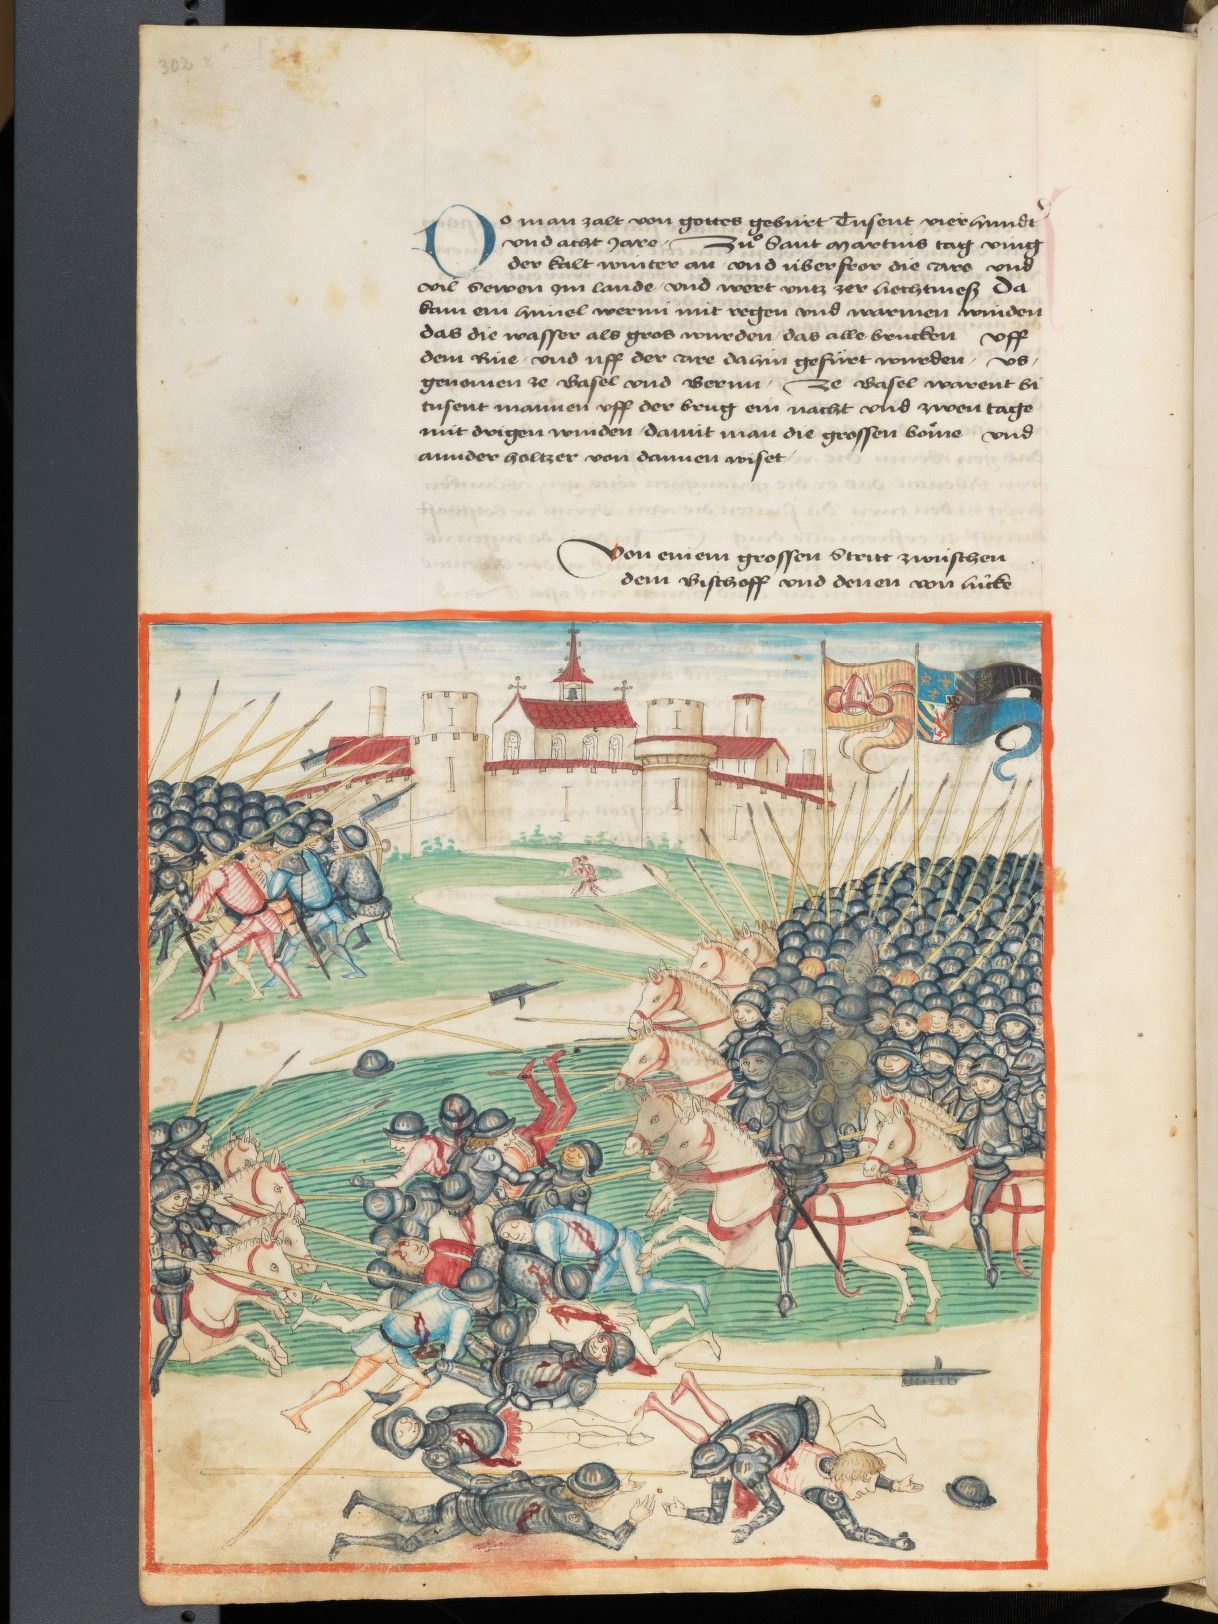 Bern, Burgerbibliothek, Mss.h.h.I.1, f. 302 – Diebold Schilling, Amtliche Berner Chronik, vol. 1 http://www.e-codices.unifr.ch/en/bbb/Mss-hh-I0001/302/0/Sequence-47